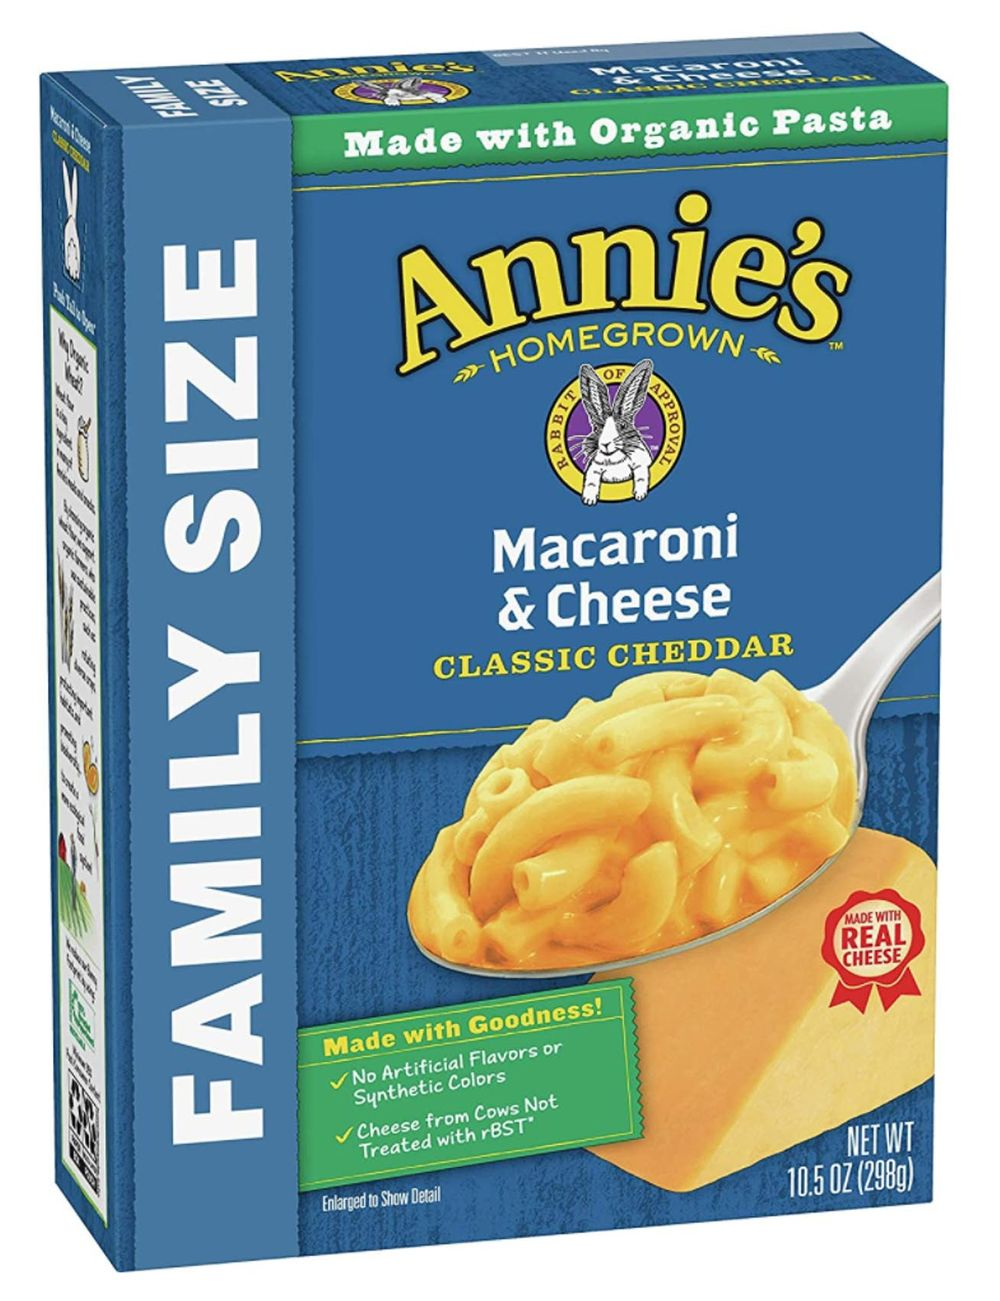 annies_classic_cheddar_macaroni_cheese.jpg